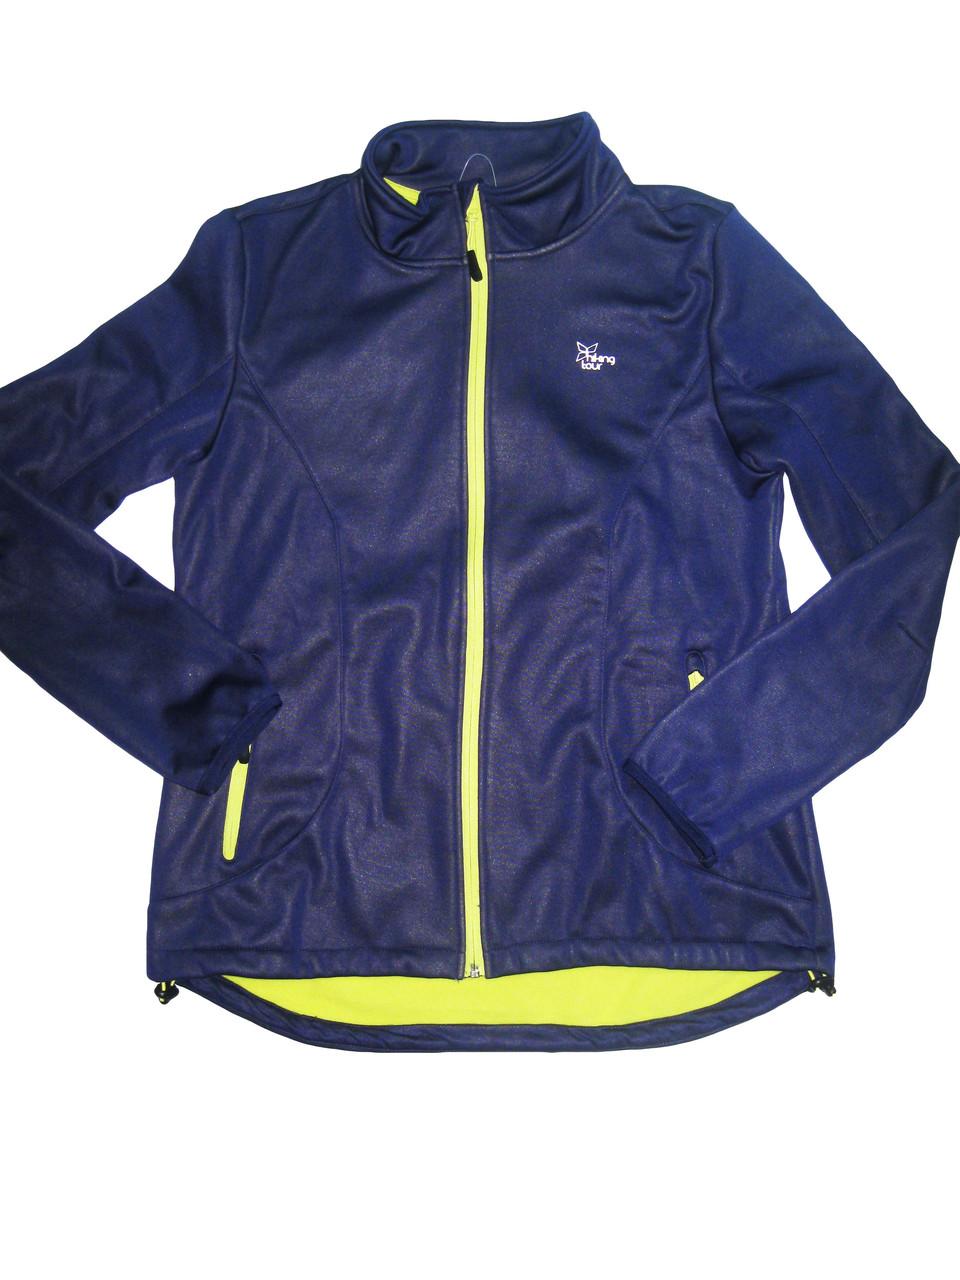 Куртка женская на флисе, CRIVIT, размер М, арт. Ж-164